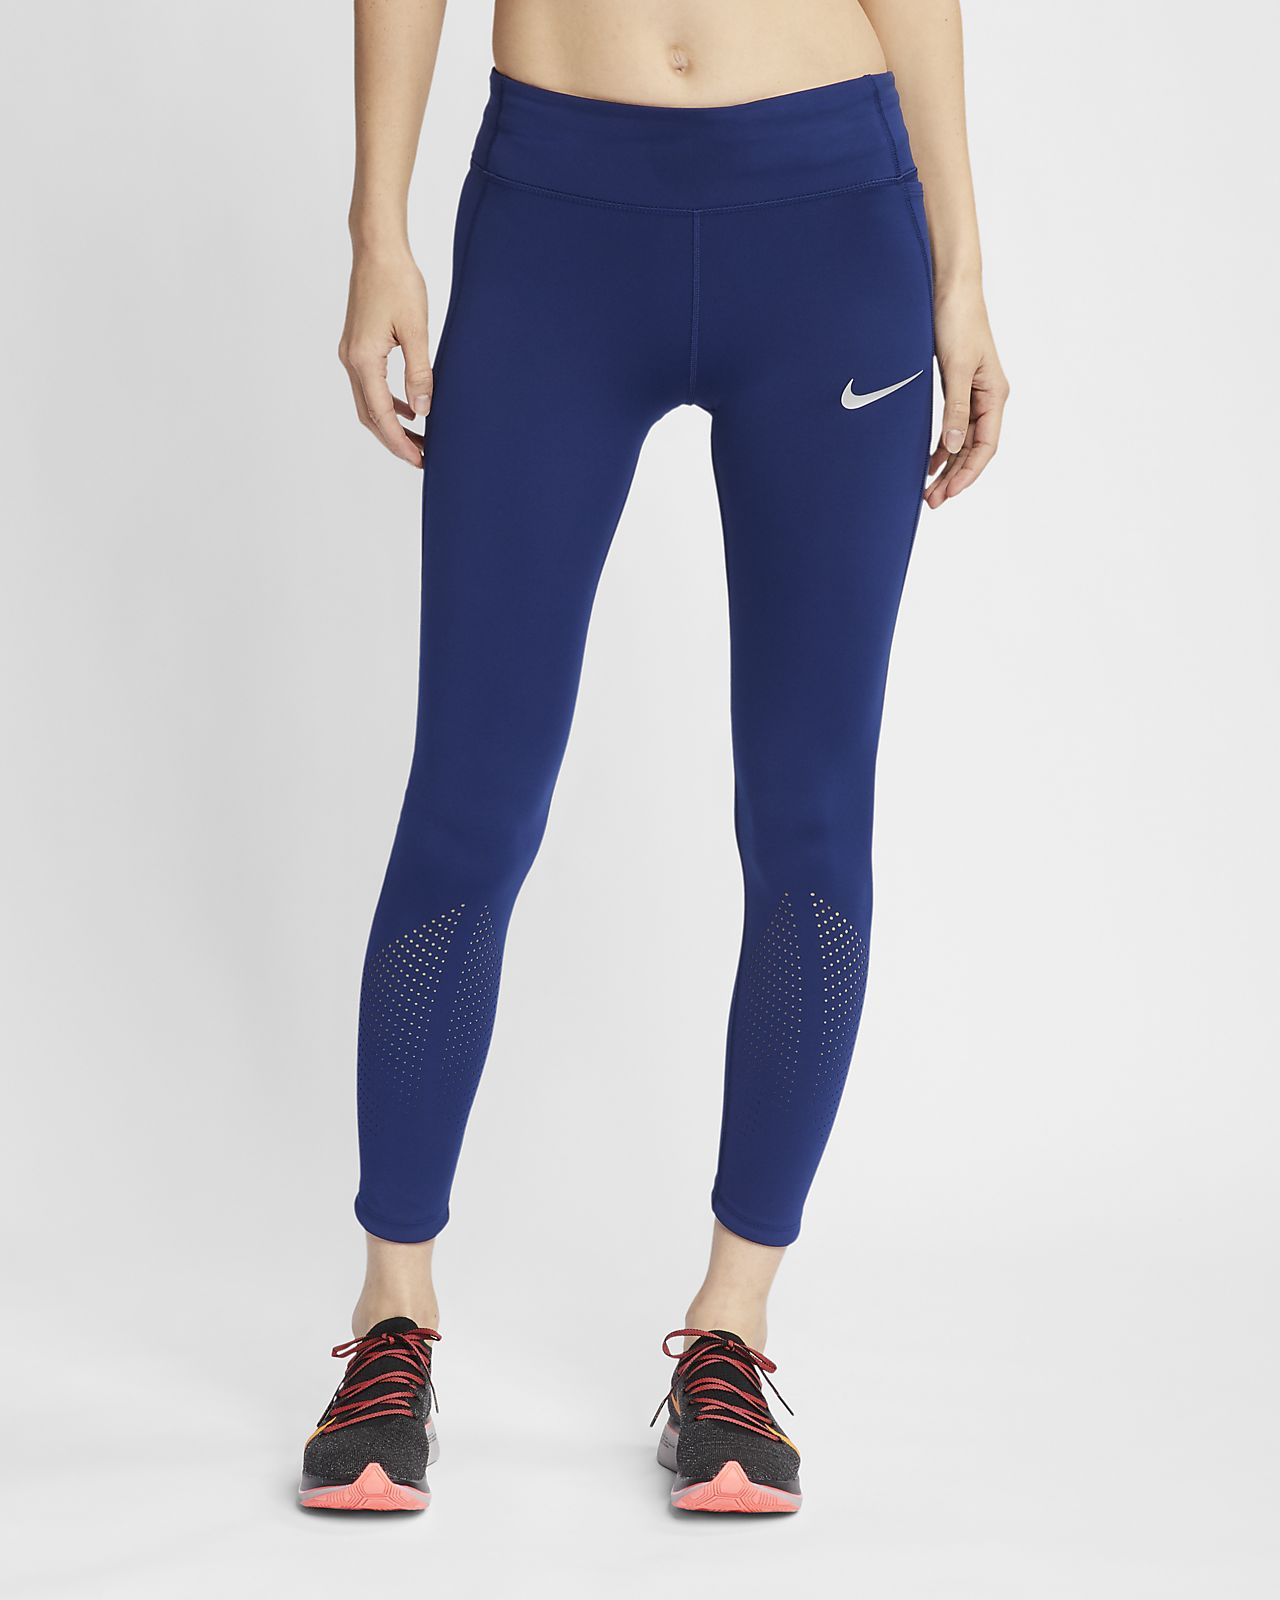 68cbe8795054 Nike Epic Lux Women s Tights. Nike.com HR